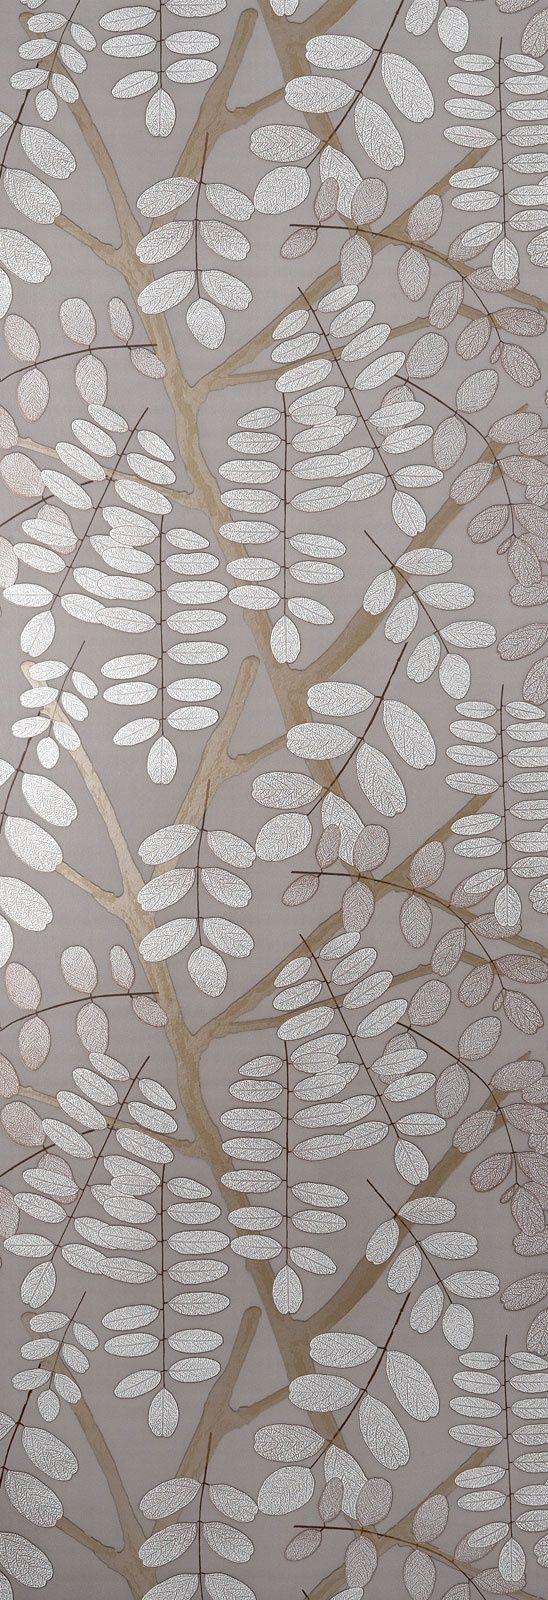 Tree Tops Wallpaper Jocelyn WarnerThis Would Be Pretty Hand Painted On A Wall Geometric